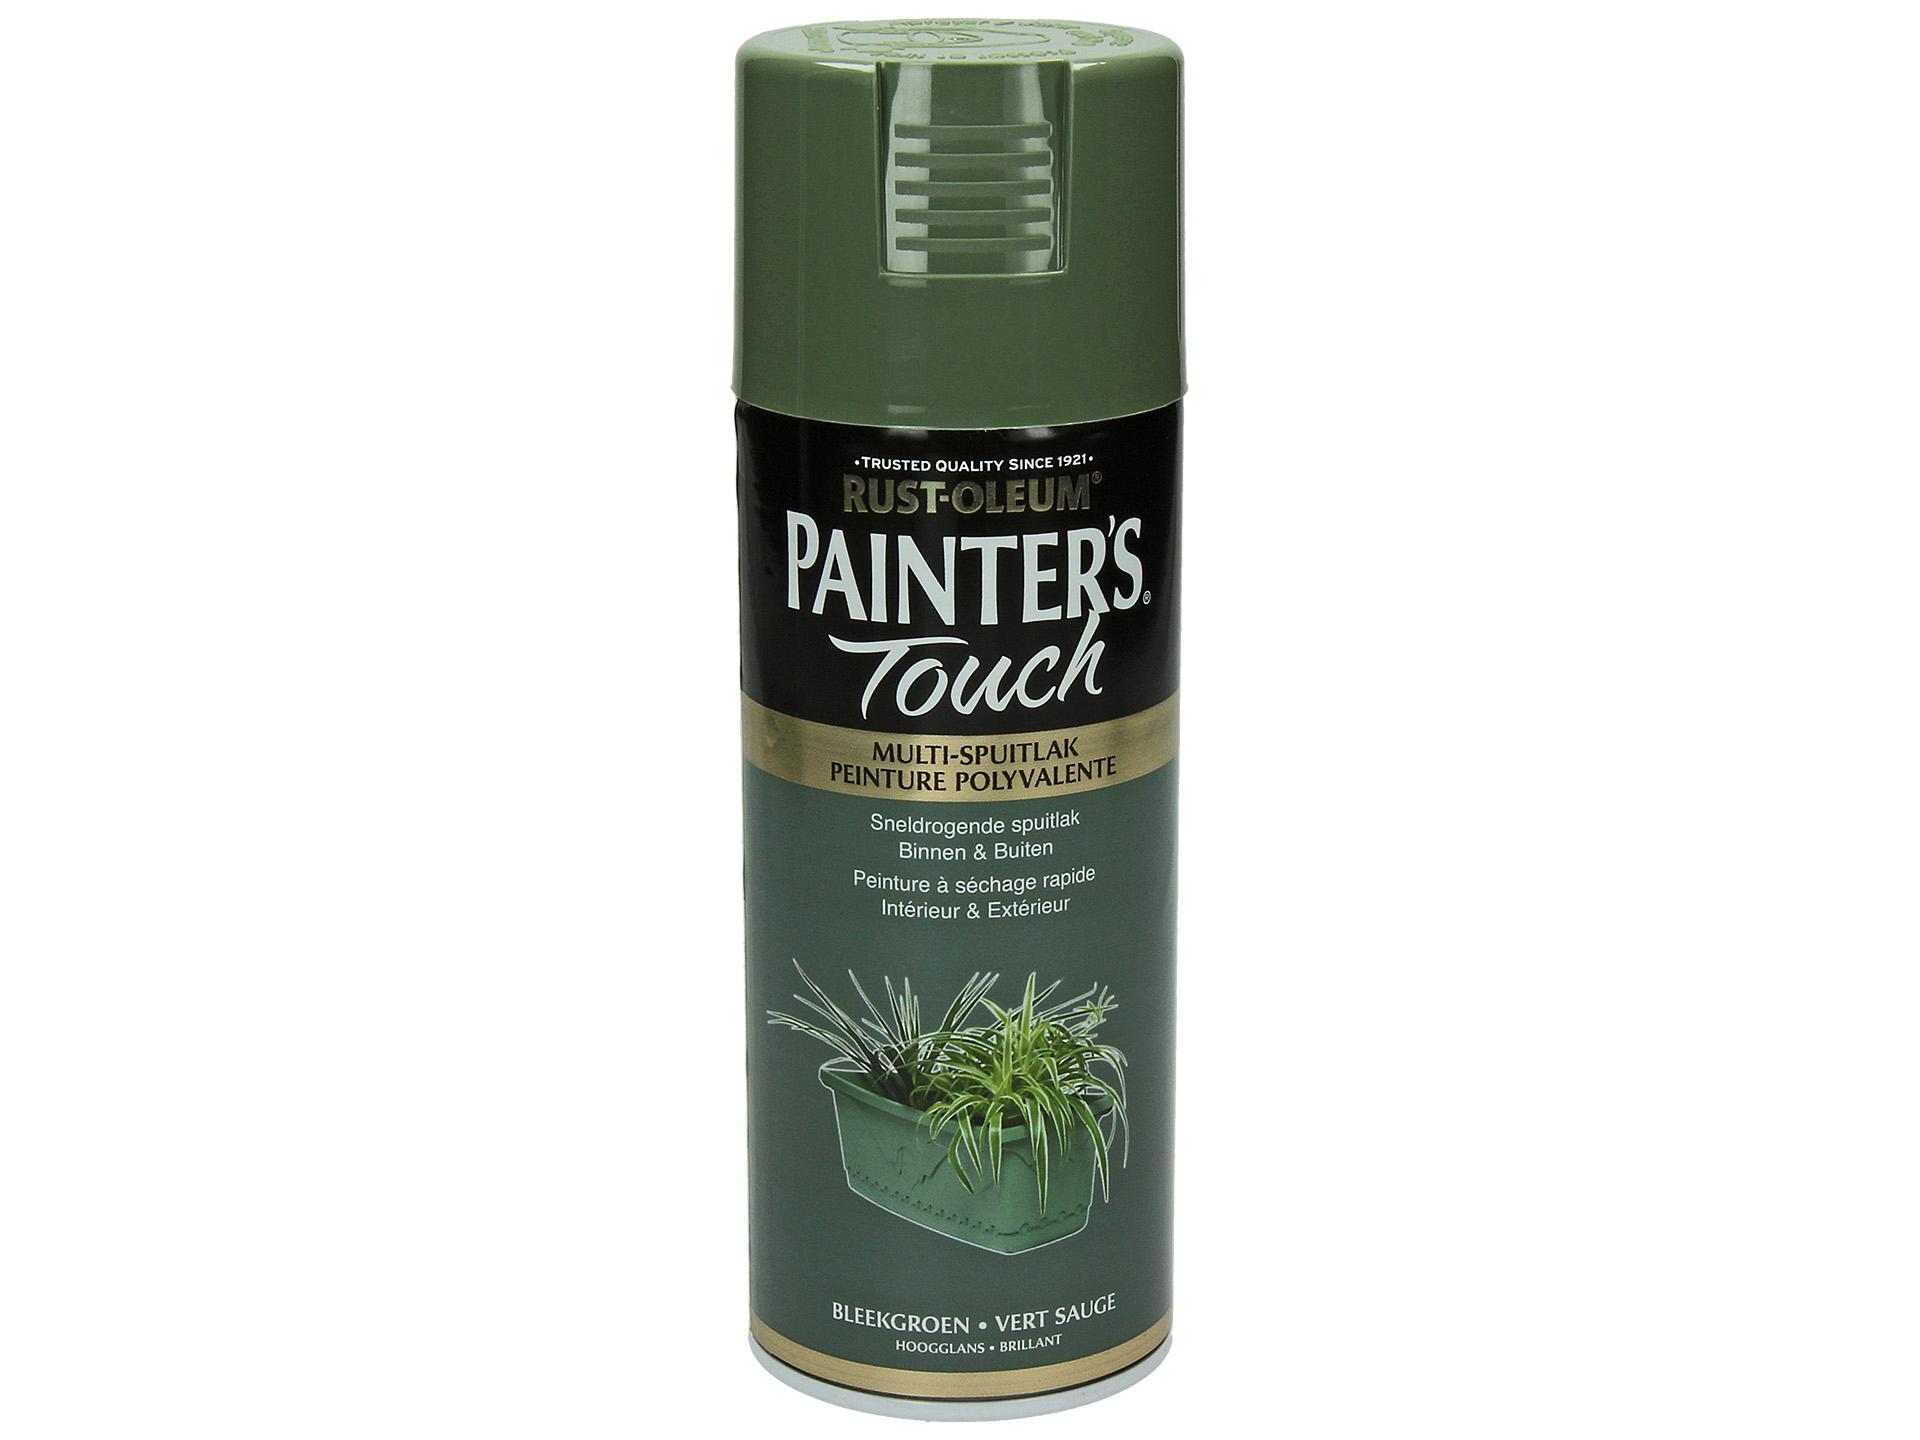 Code Couleur Vert Sauge laque en spray painter's touch brillant 400ml vert sauge